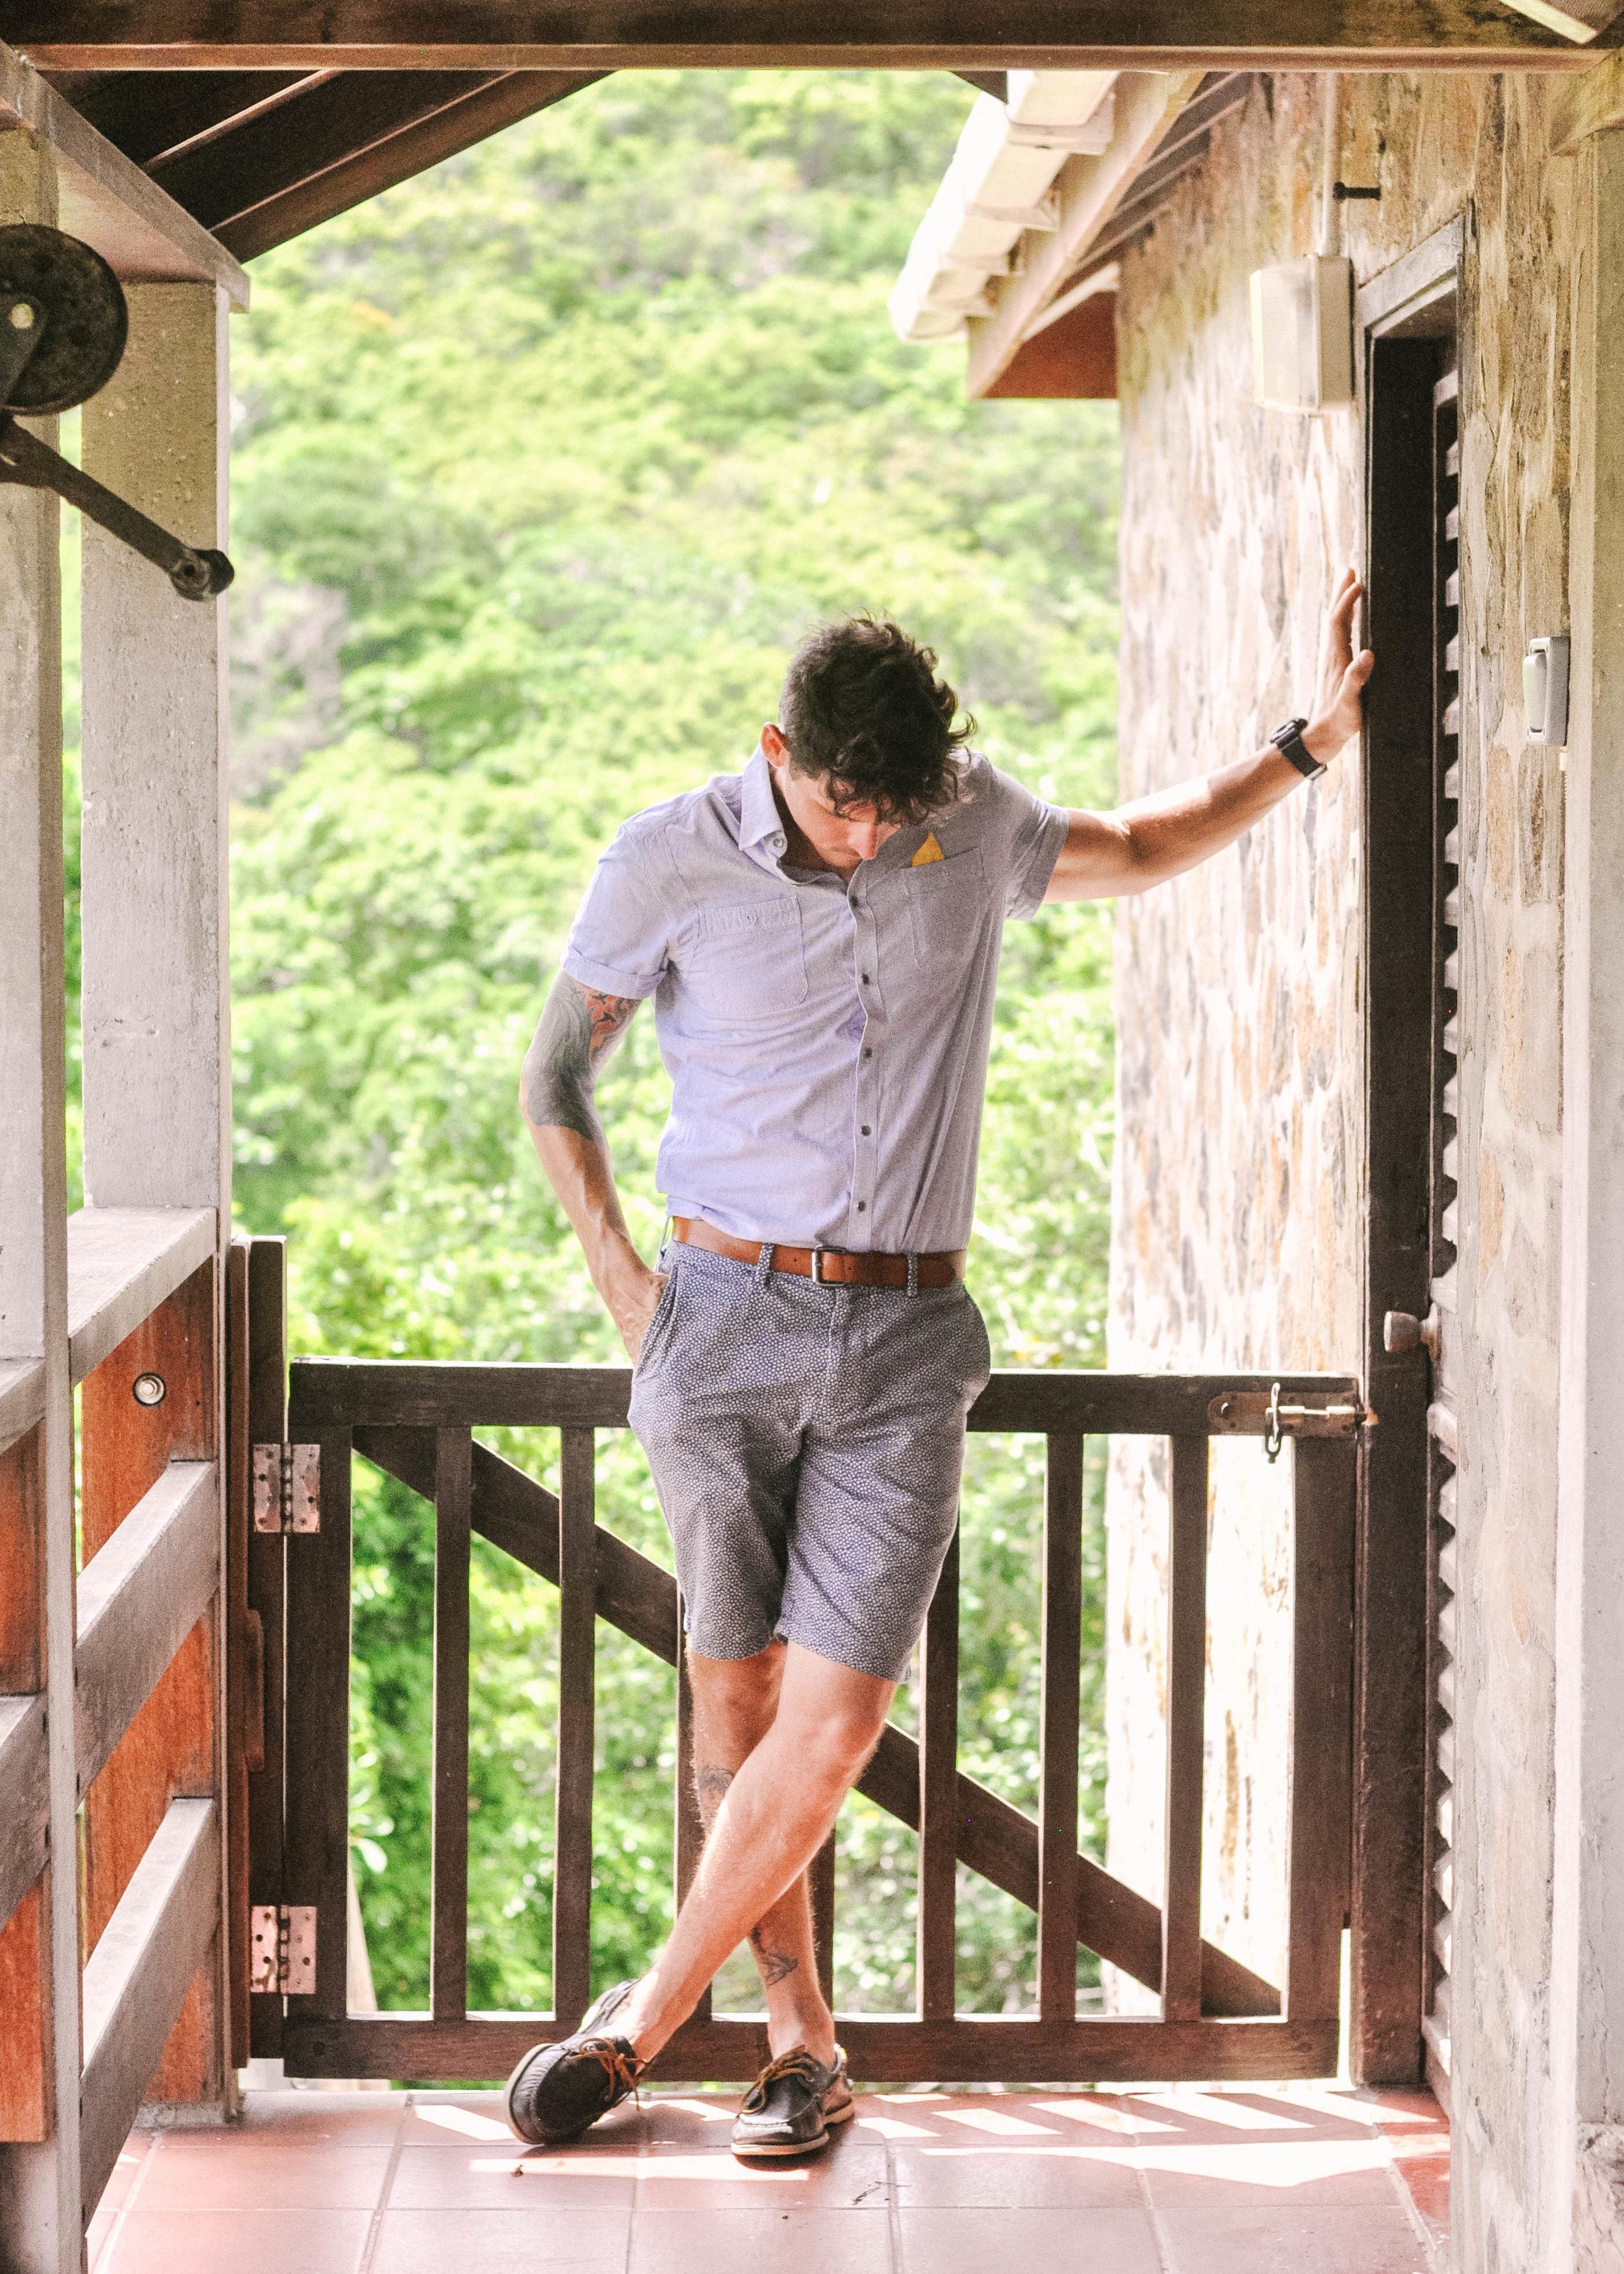 Man next to wooden railing